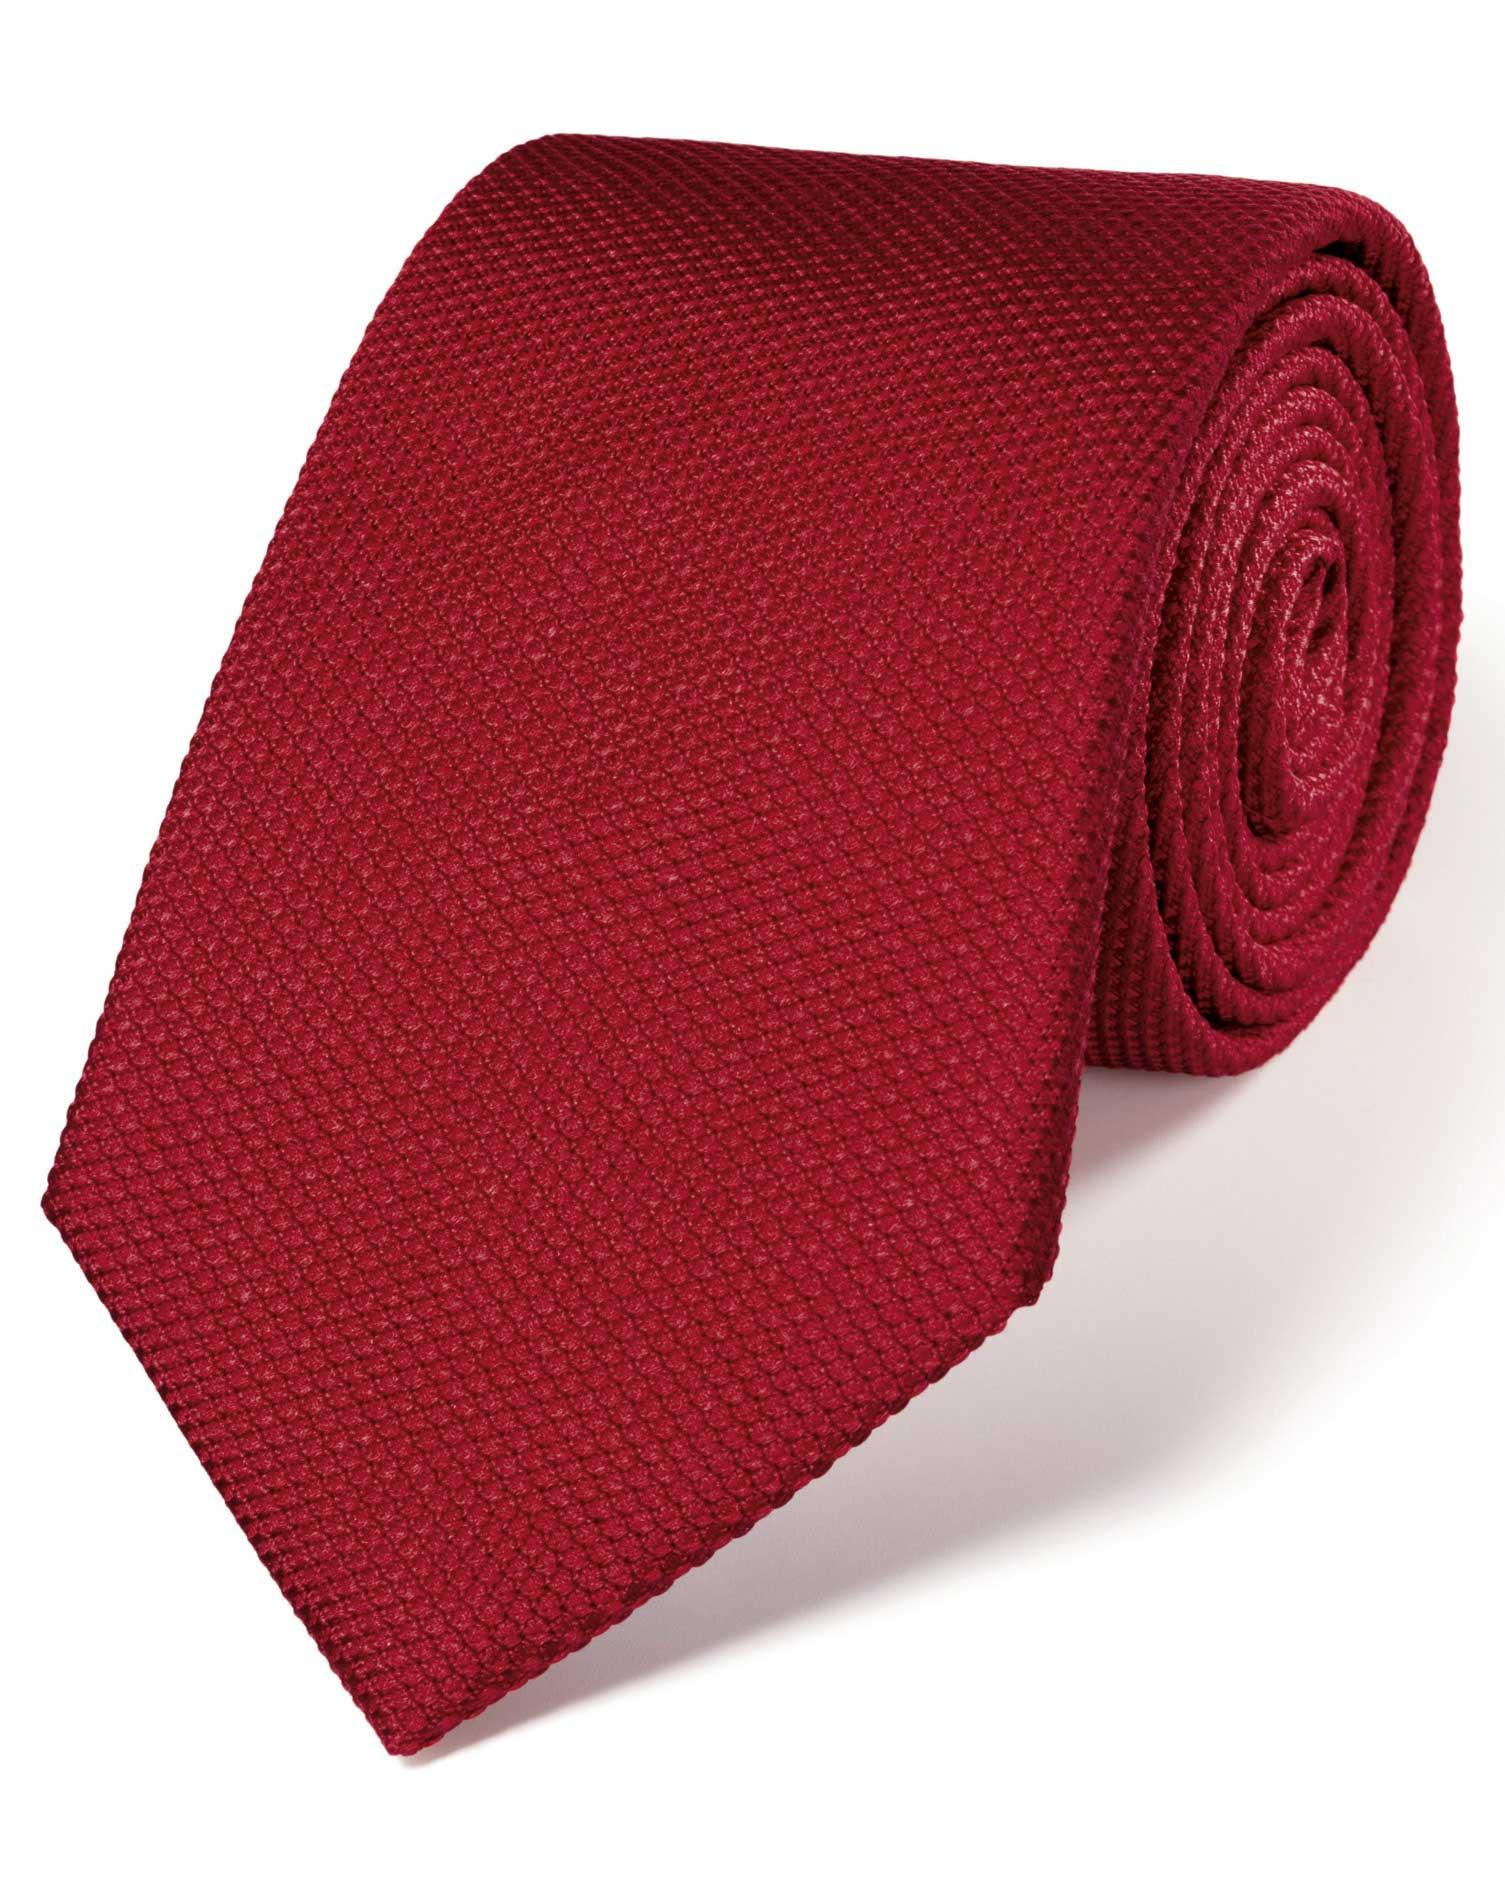 Dark Red Silk Plain Classic Tie Size OSFA by Charles Tyrwhitt